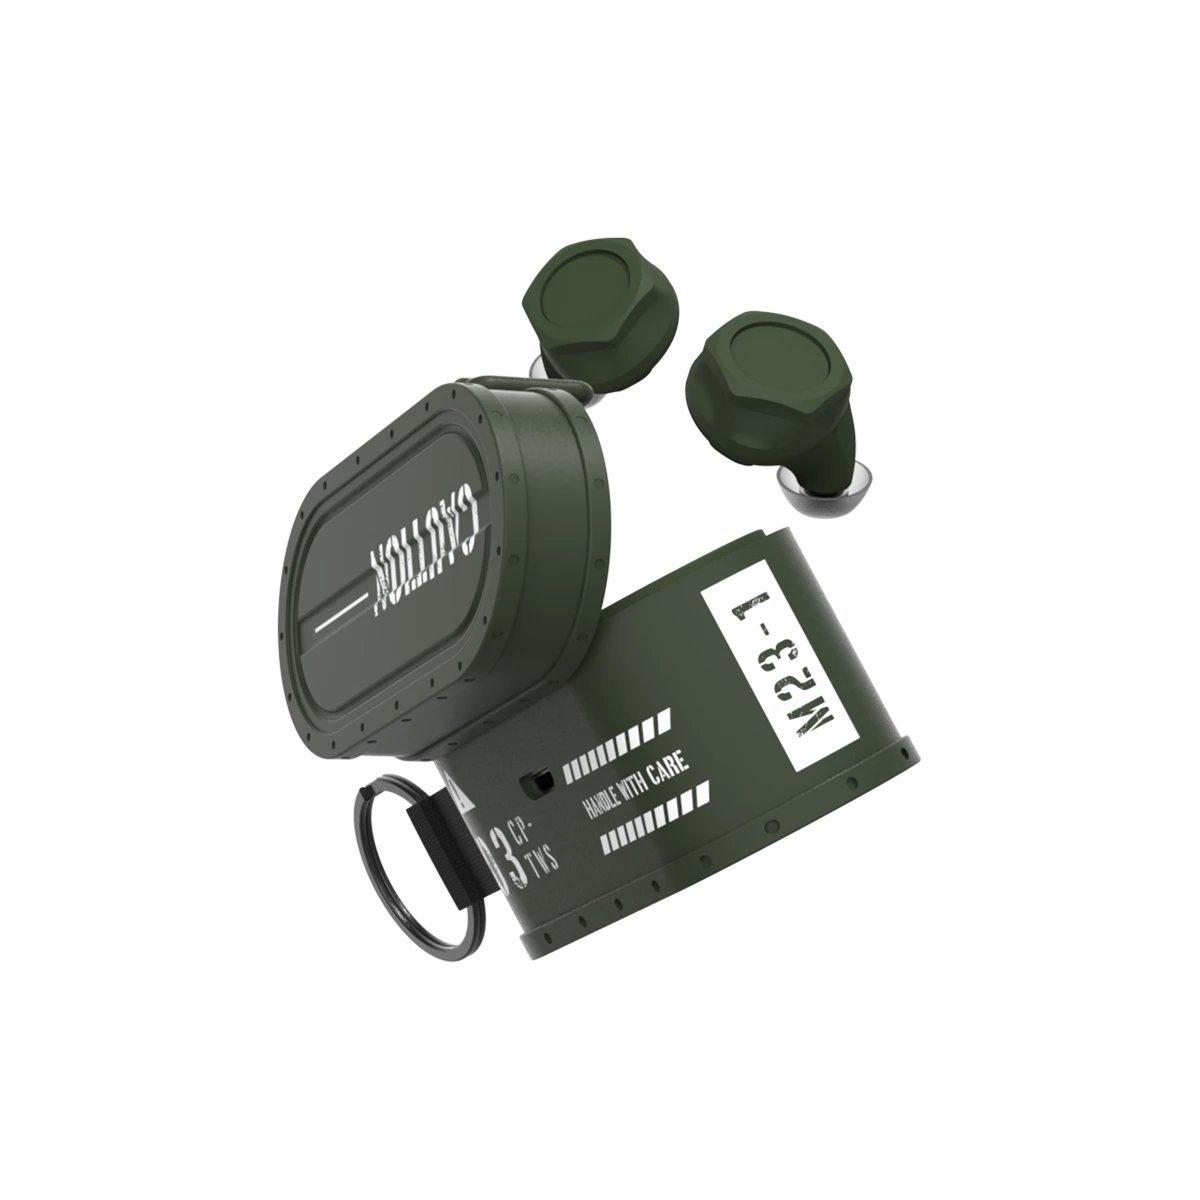 CARGO Military Style True Wireless Bluetooth Earphones GREEN (HK Authorised Product)